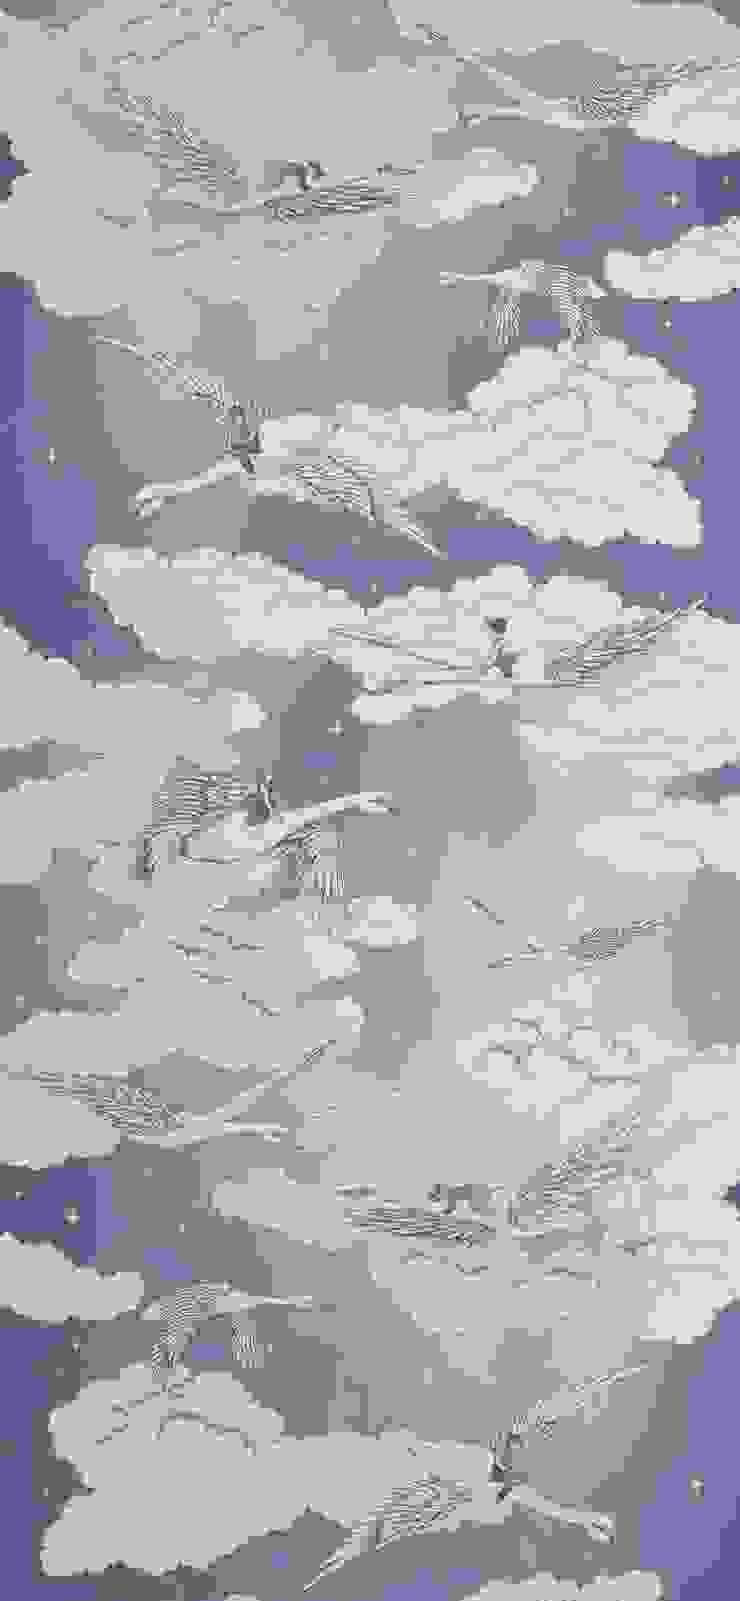 SWANS Lavender Wallpaper 10m Roll Hevensent 家居用品配件與裝飾品